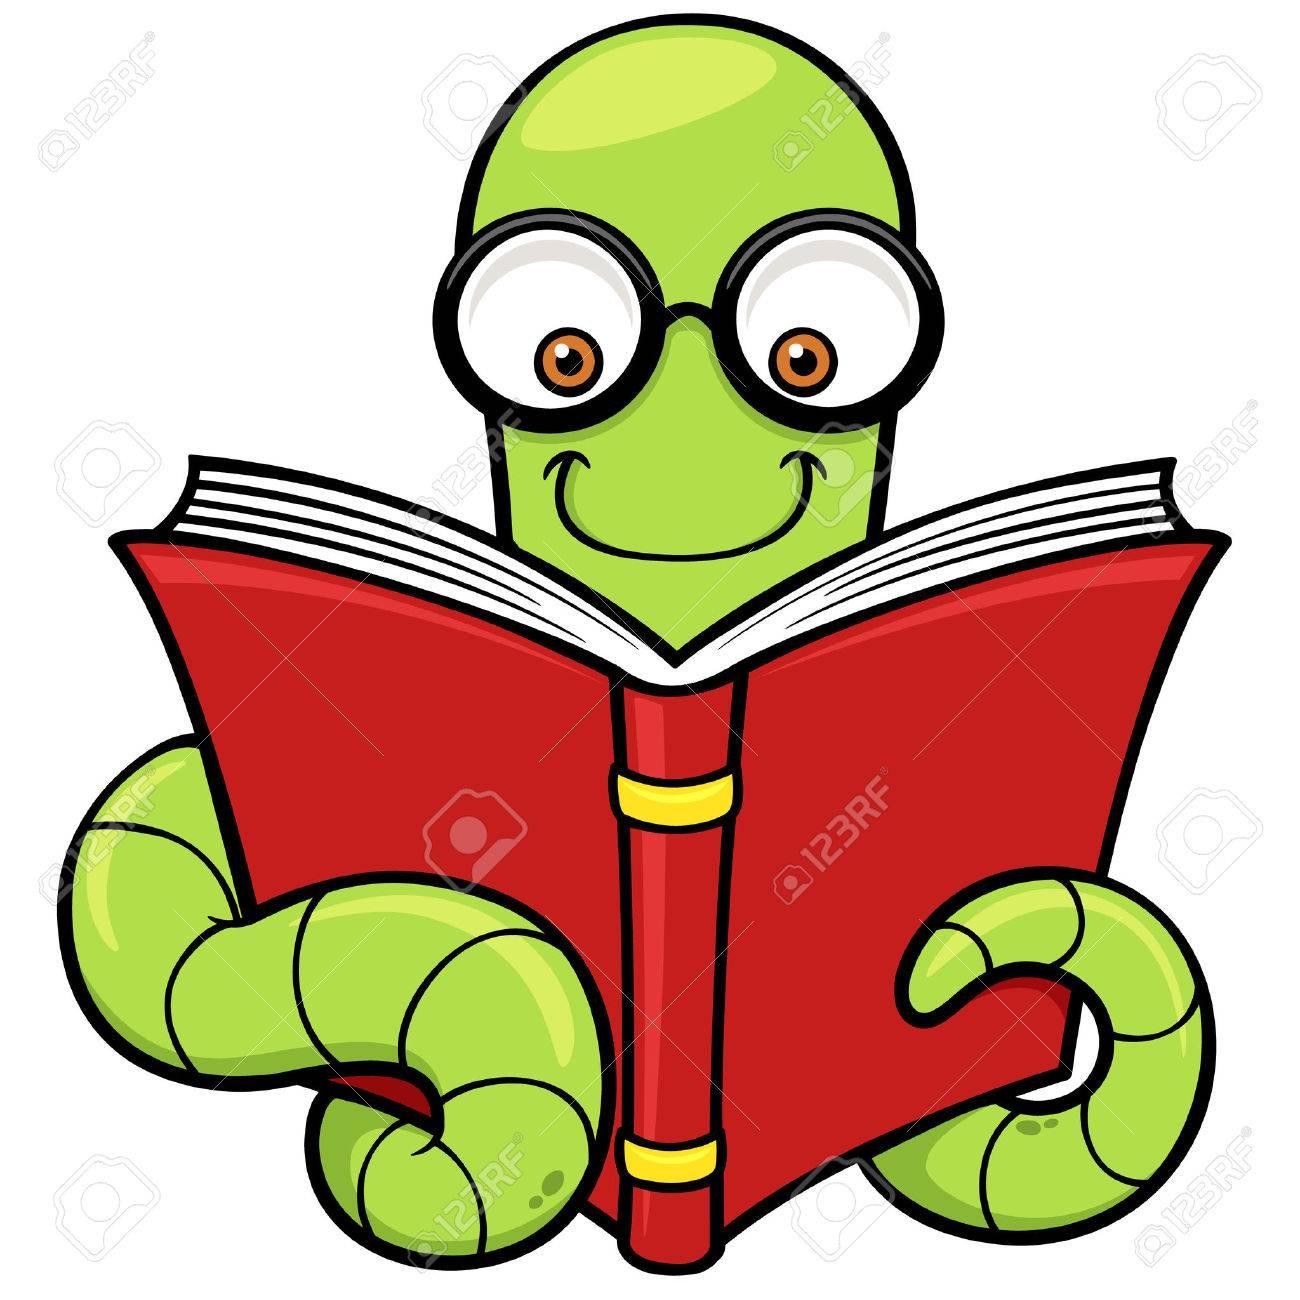 vector illustration of cartoon book worm royalty free cliparts rh 123rf com Bookworm Clip Art Black and White Cute Bookworm